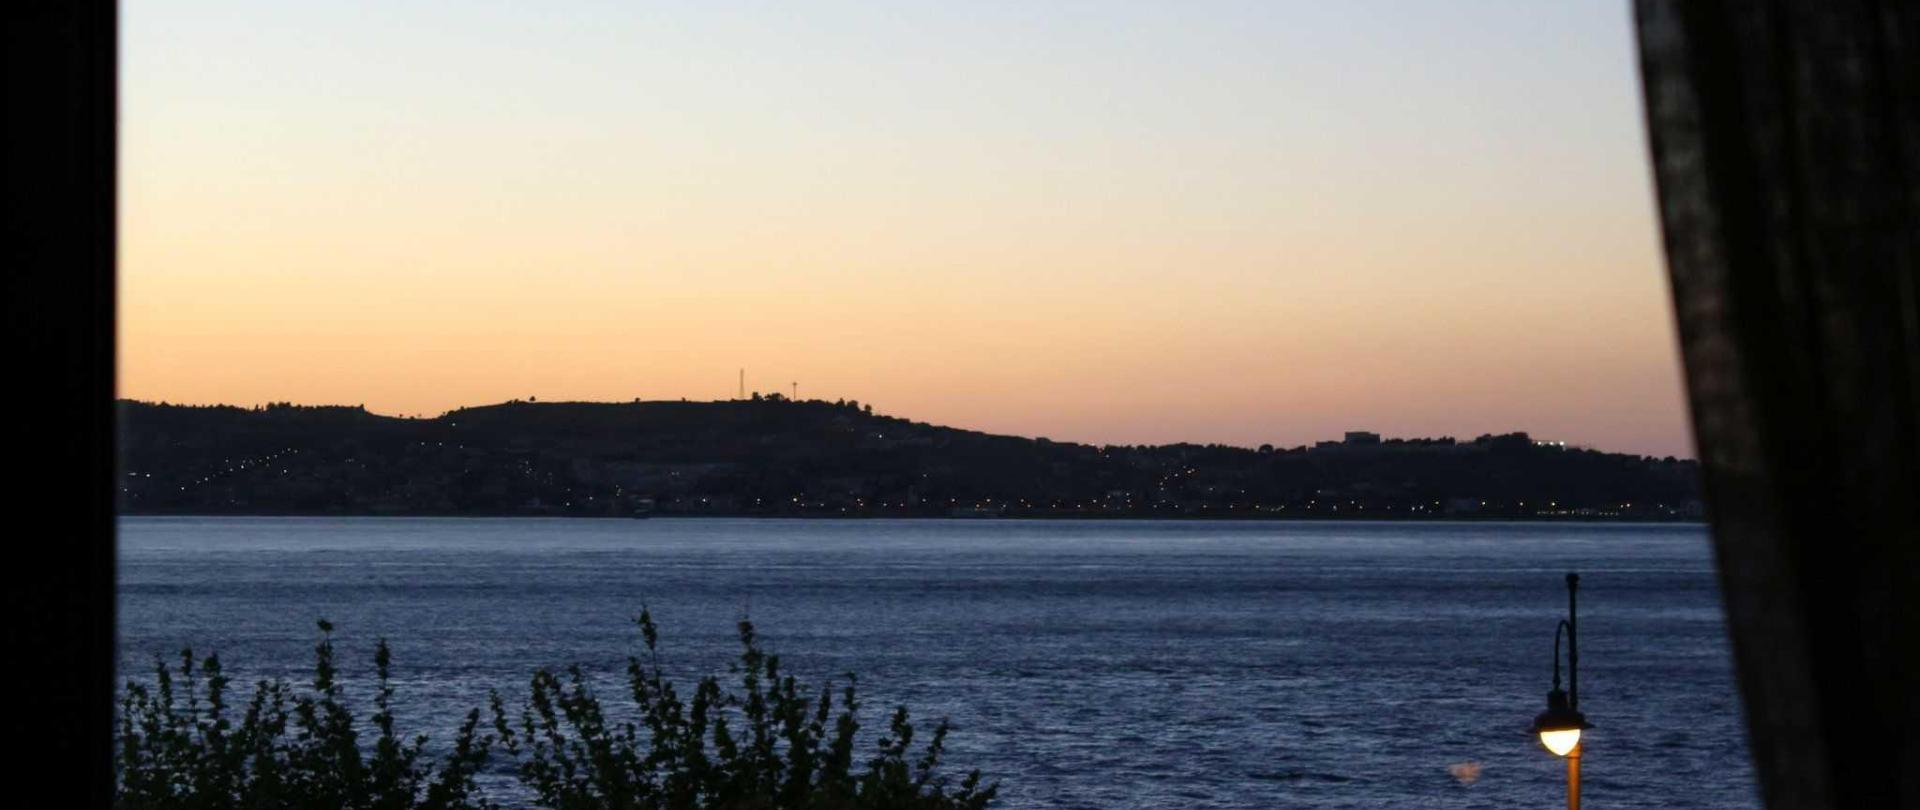 panorama-veranda-beb-sirio-villa-san-giovanni-1.jpg